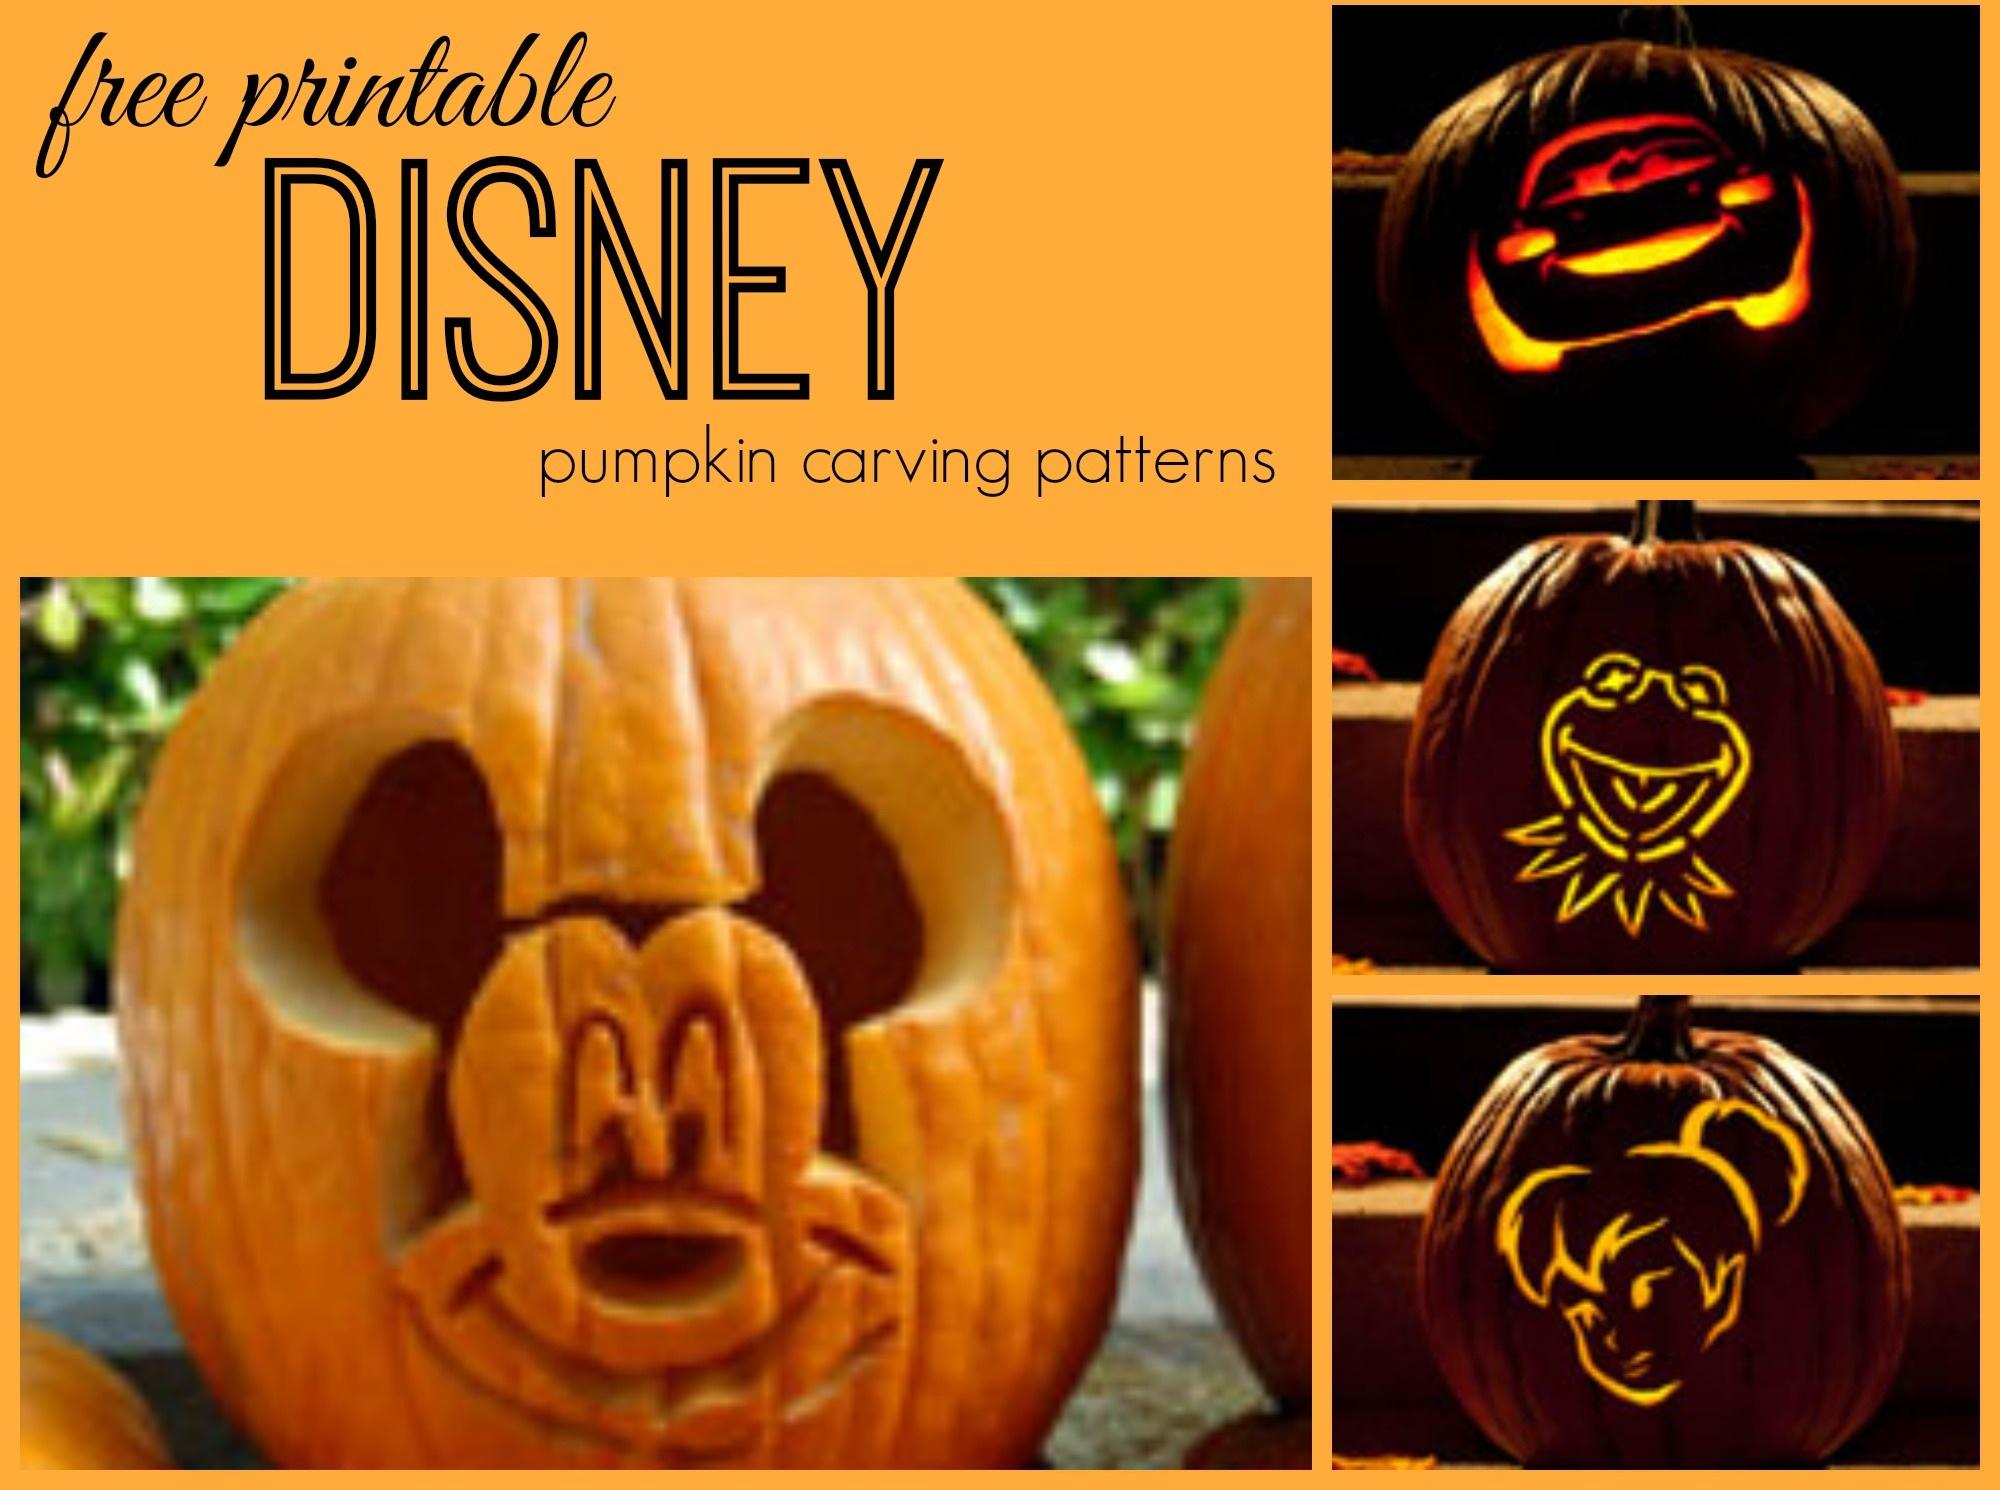 Disney Pumpkin Carving Patterns - Frugal Fanatic - Free Pumpkin Carving Patterns Disney Printable